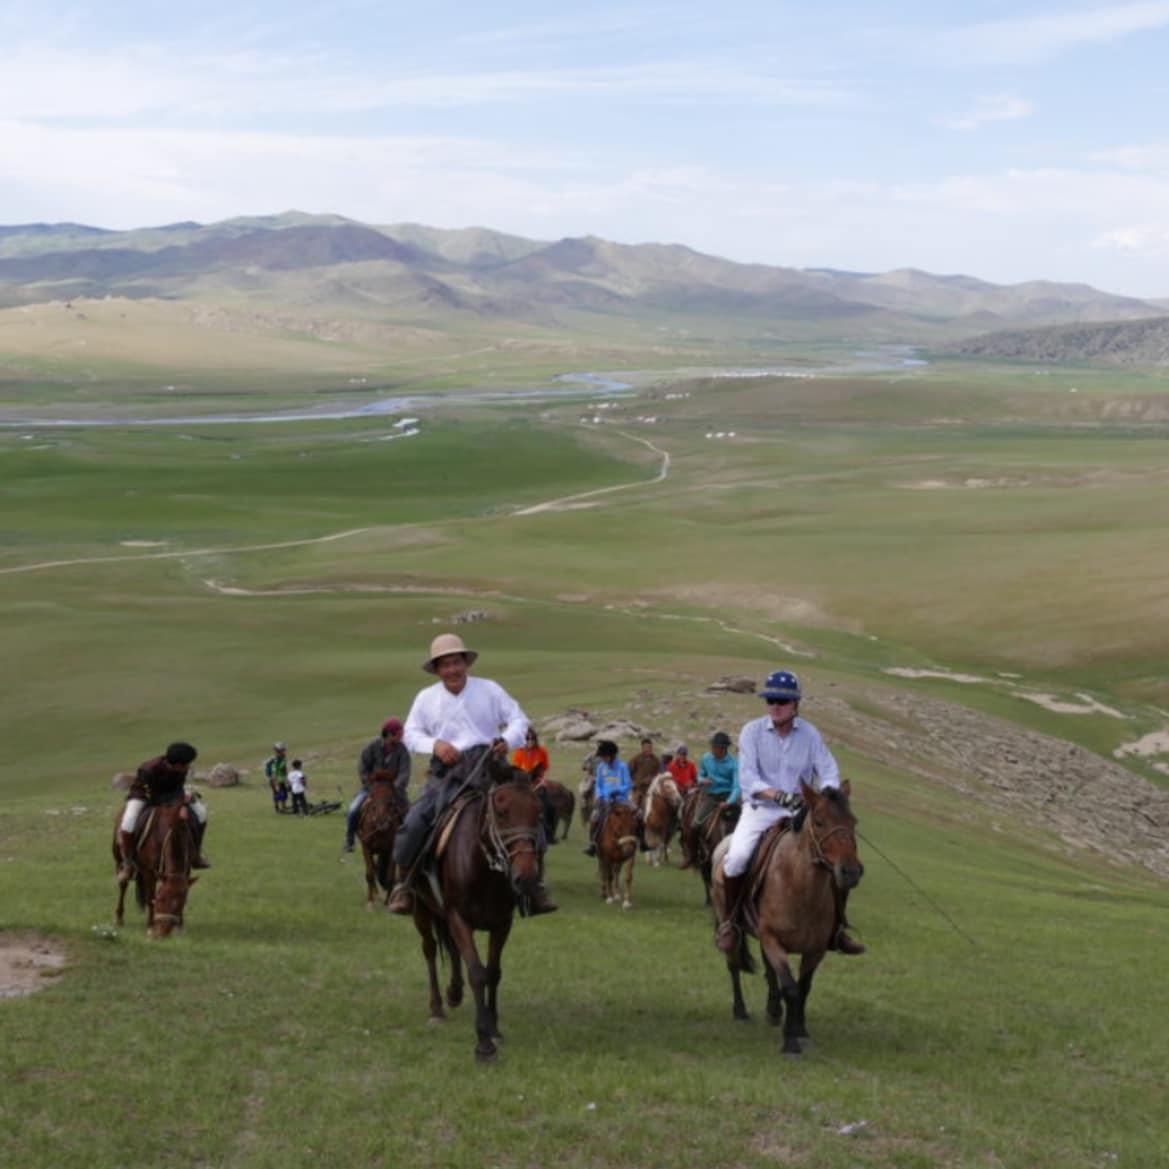 Riding Across The Breathtaking Mongolian Landscape - The Pavilions Mongolia